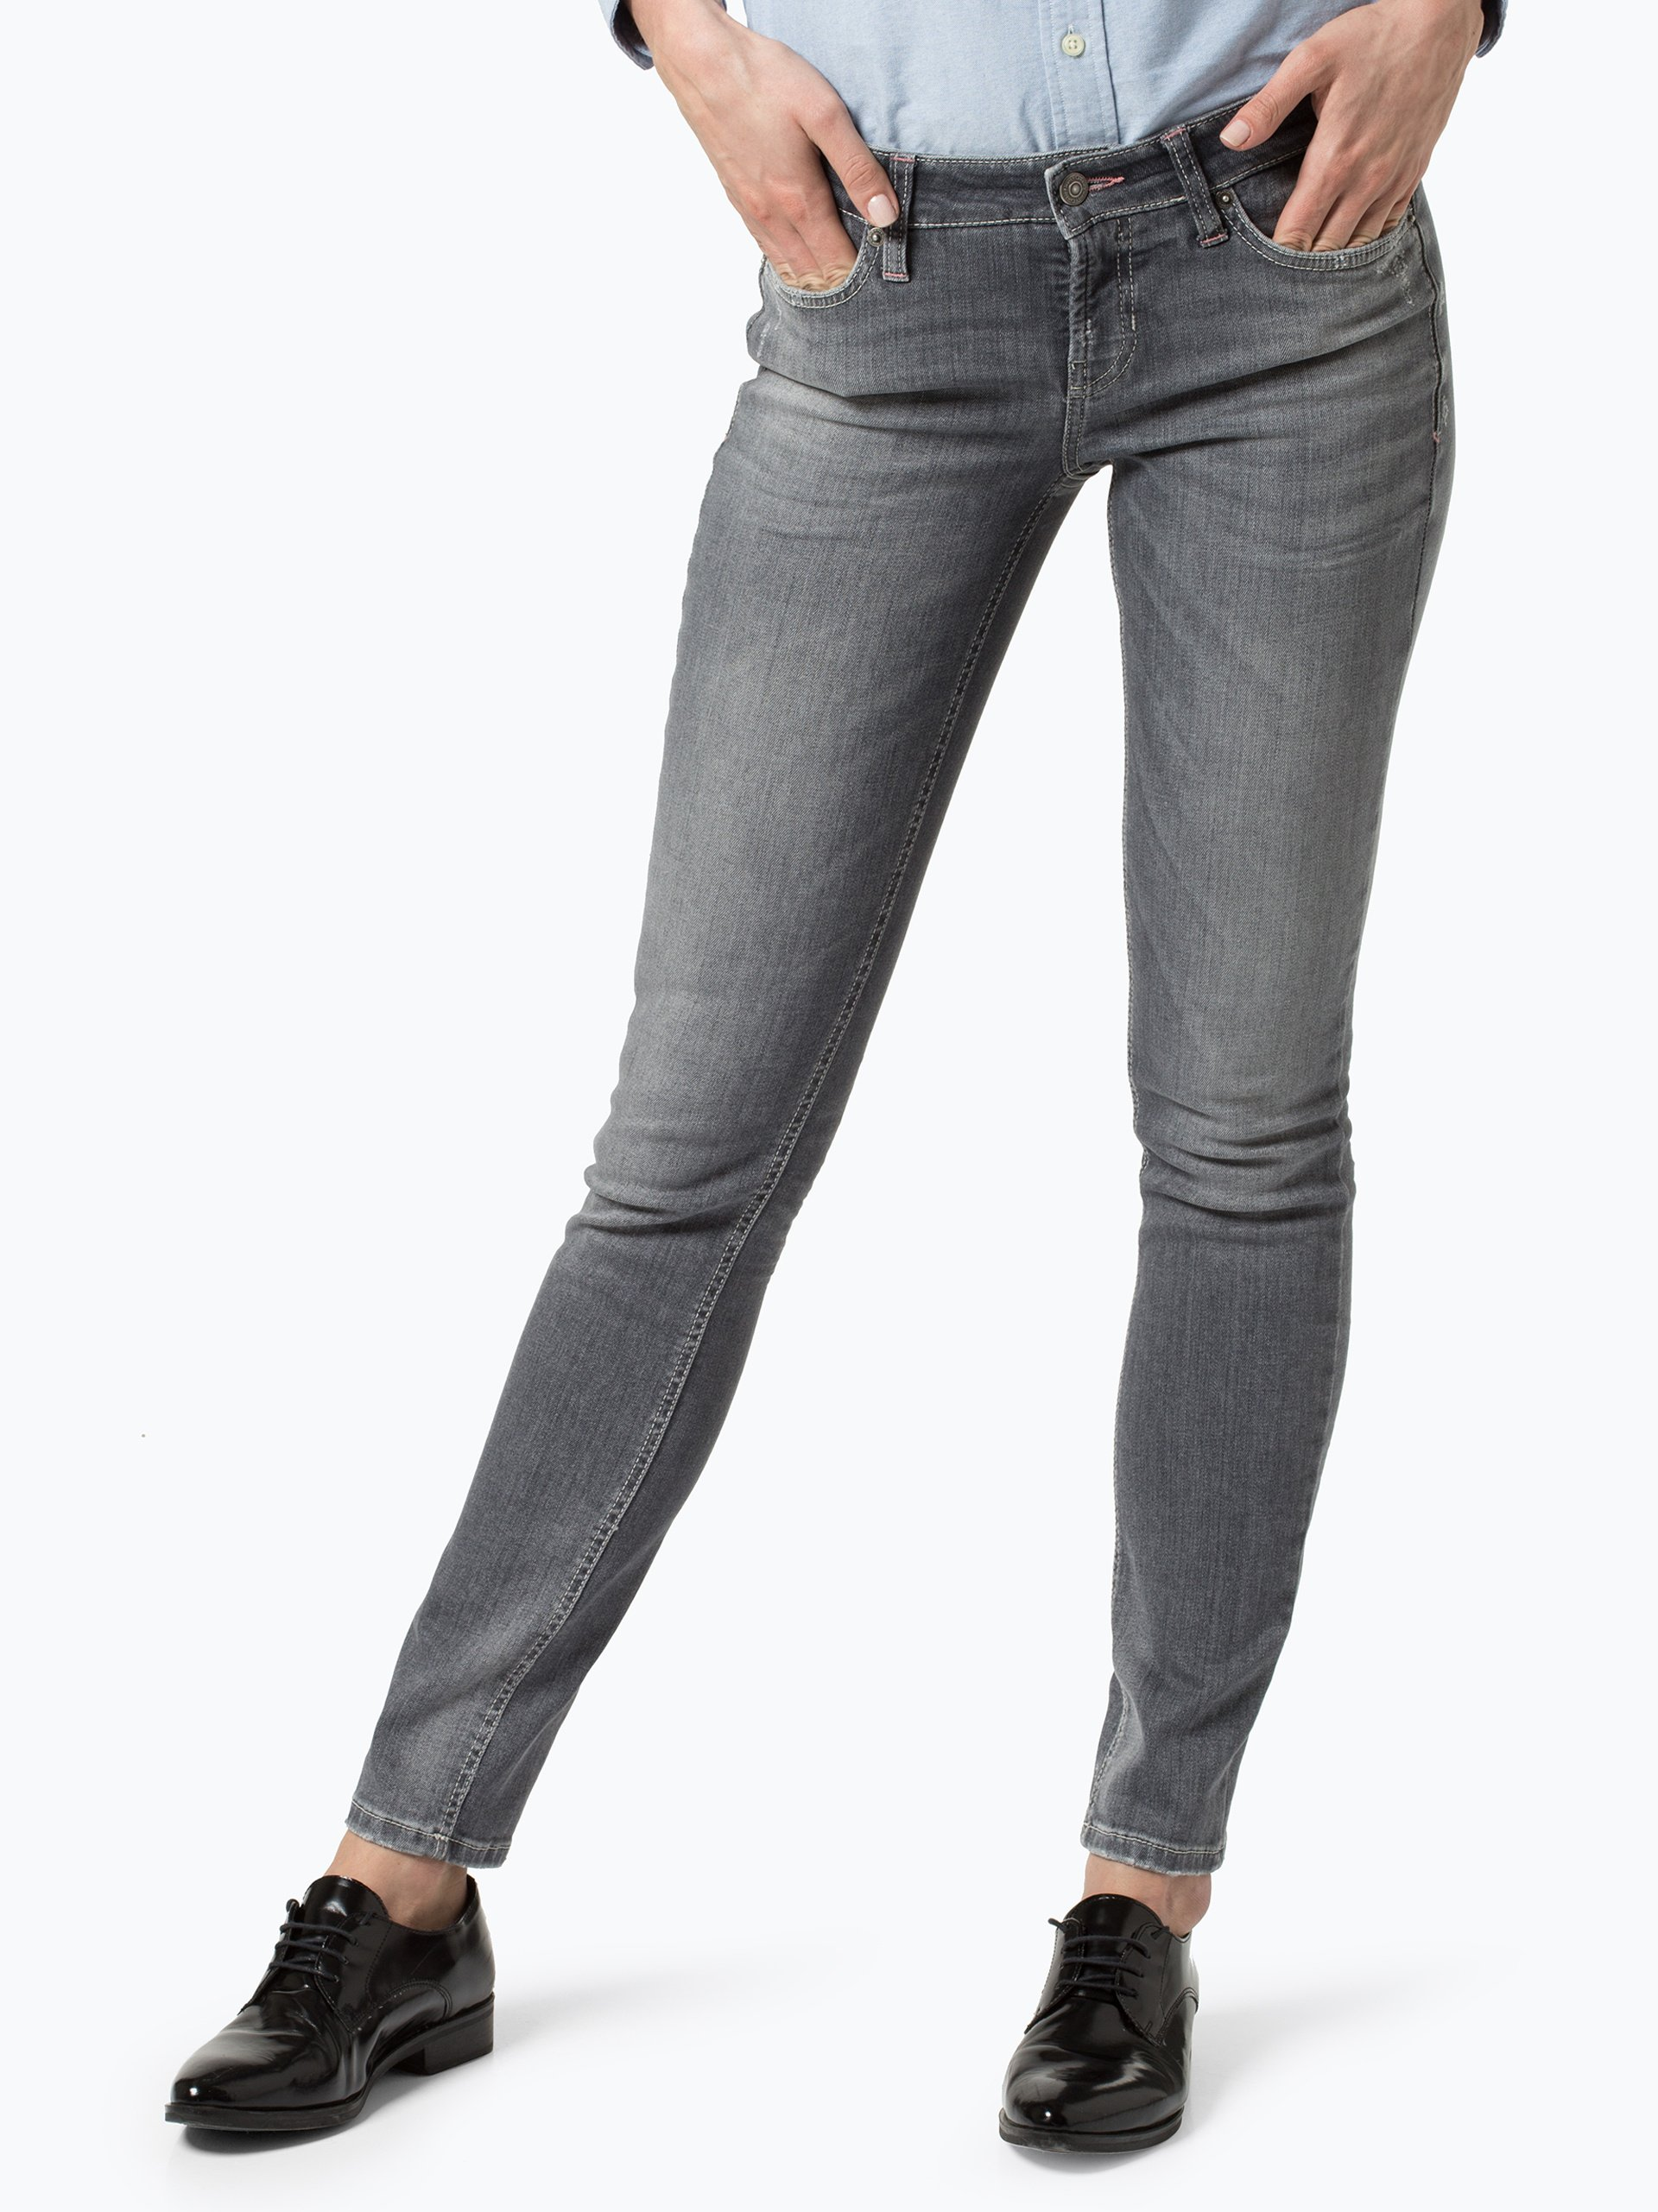 cambio damen jeans liu grau uni online kaufen peek und cloppenburg de. Black Bedroom Furniture Sets. Home Design Ideas